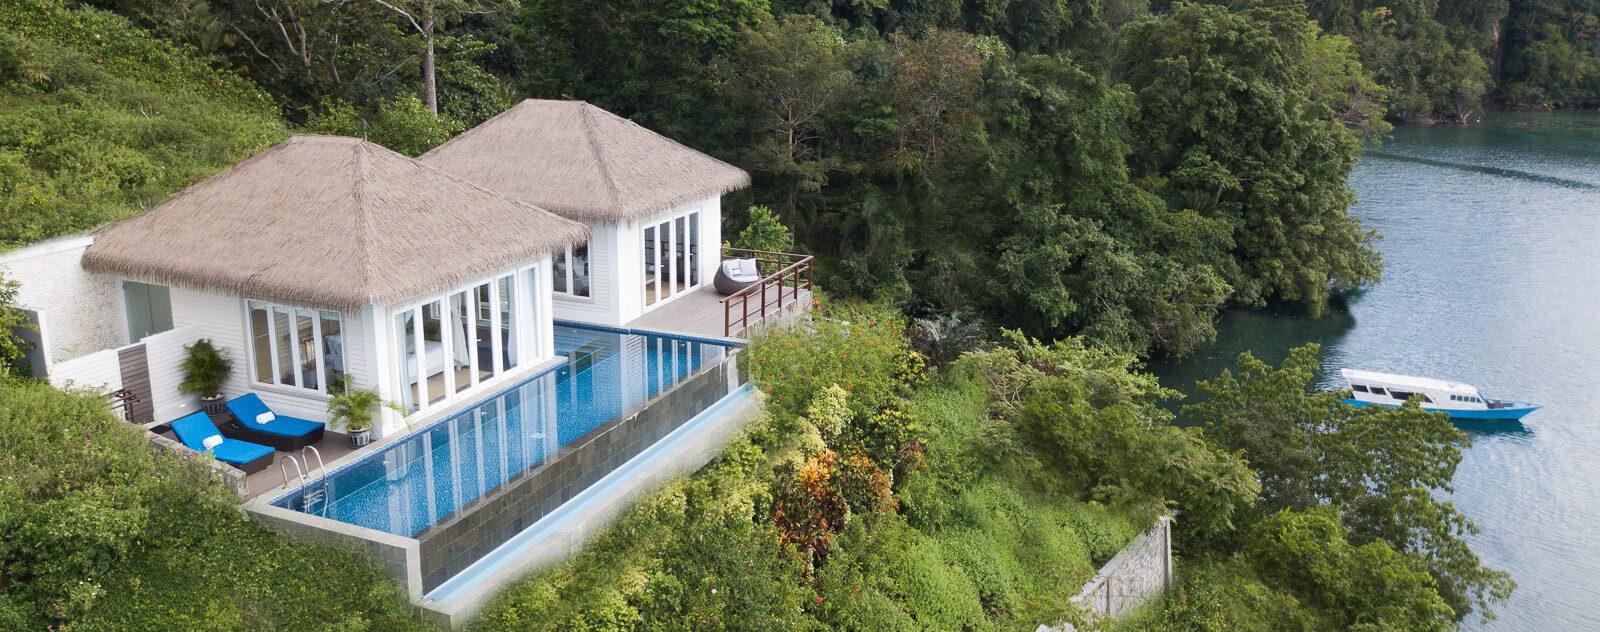 Aerial photo of the Cliffside Villa at Lembeh Resort